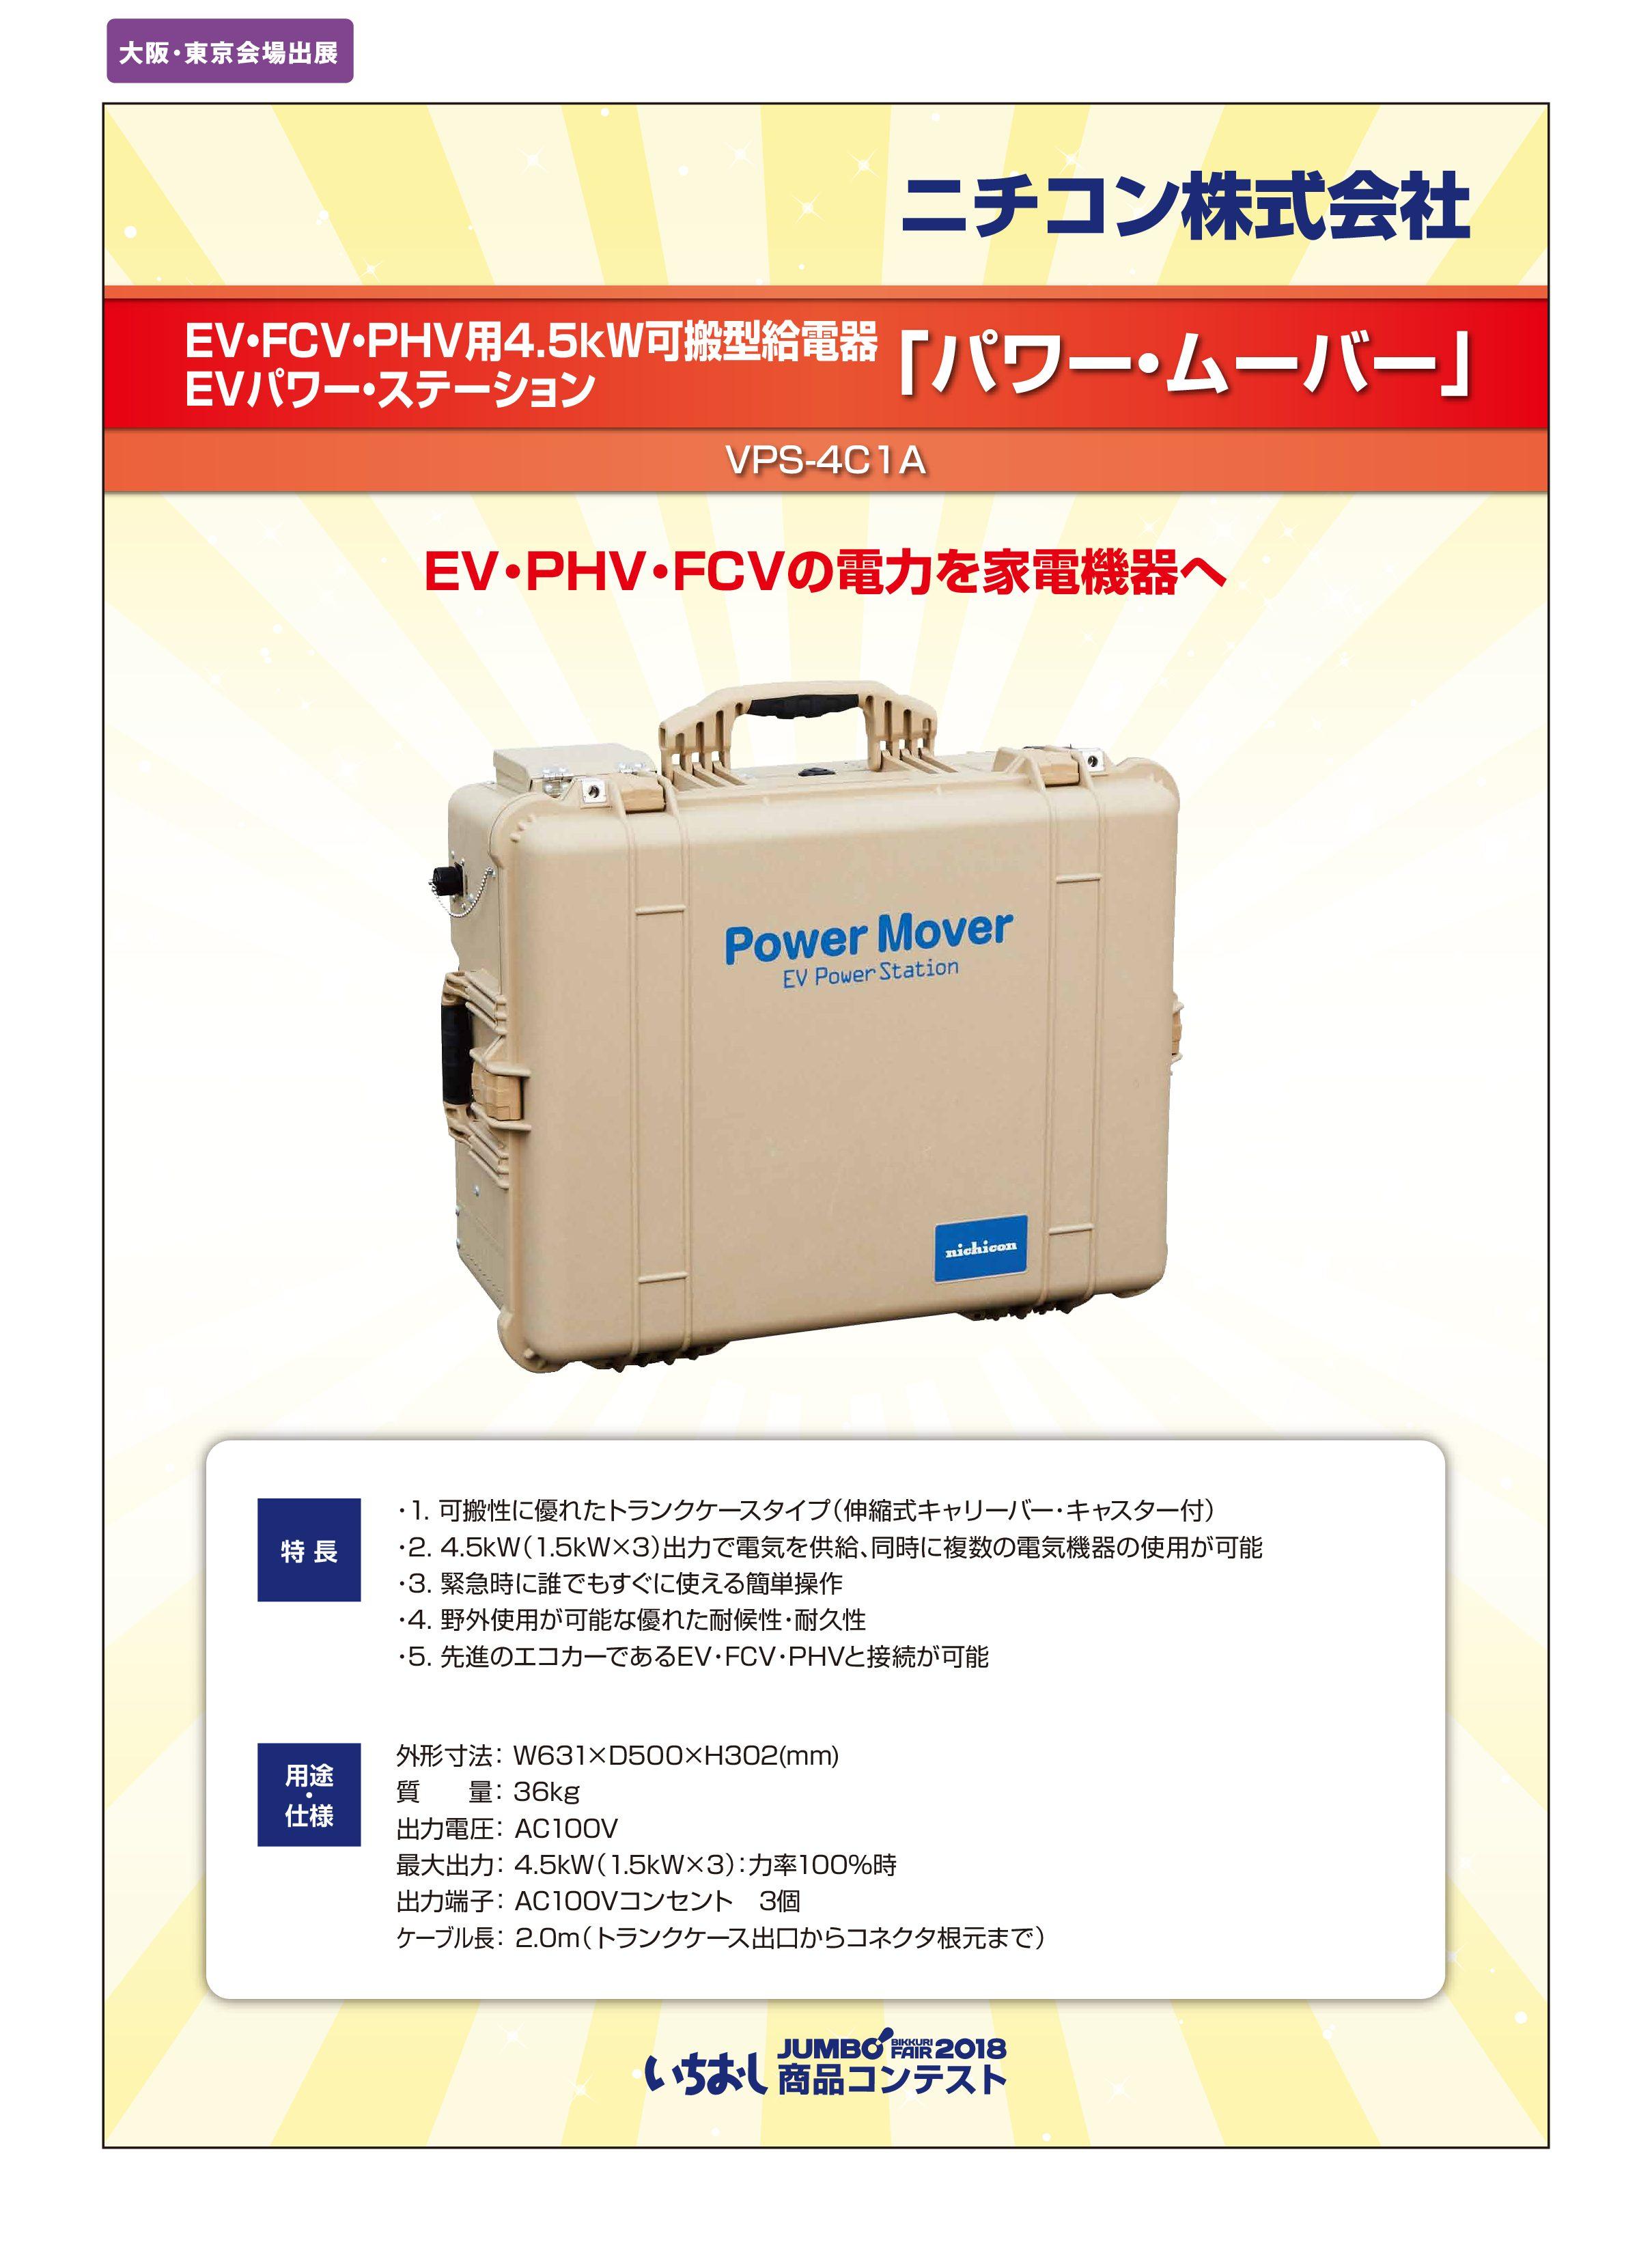 「EV・FCV・PHV用4.5kW可搬型給電器 EVパワー・ステーション『パワー・ムーバー』」ニチコン株式会社の画像